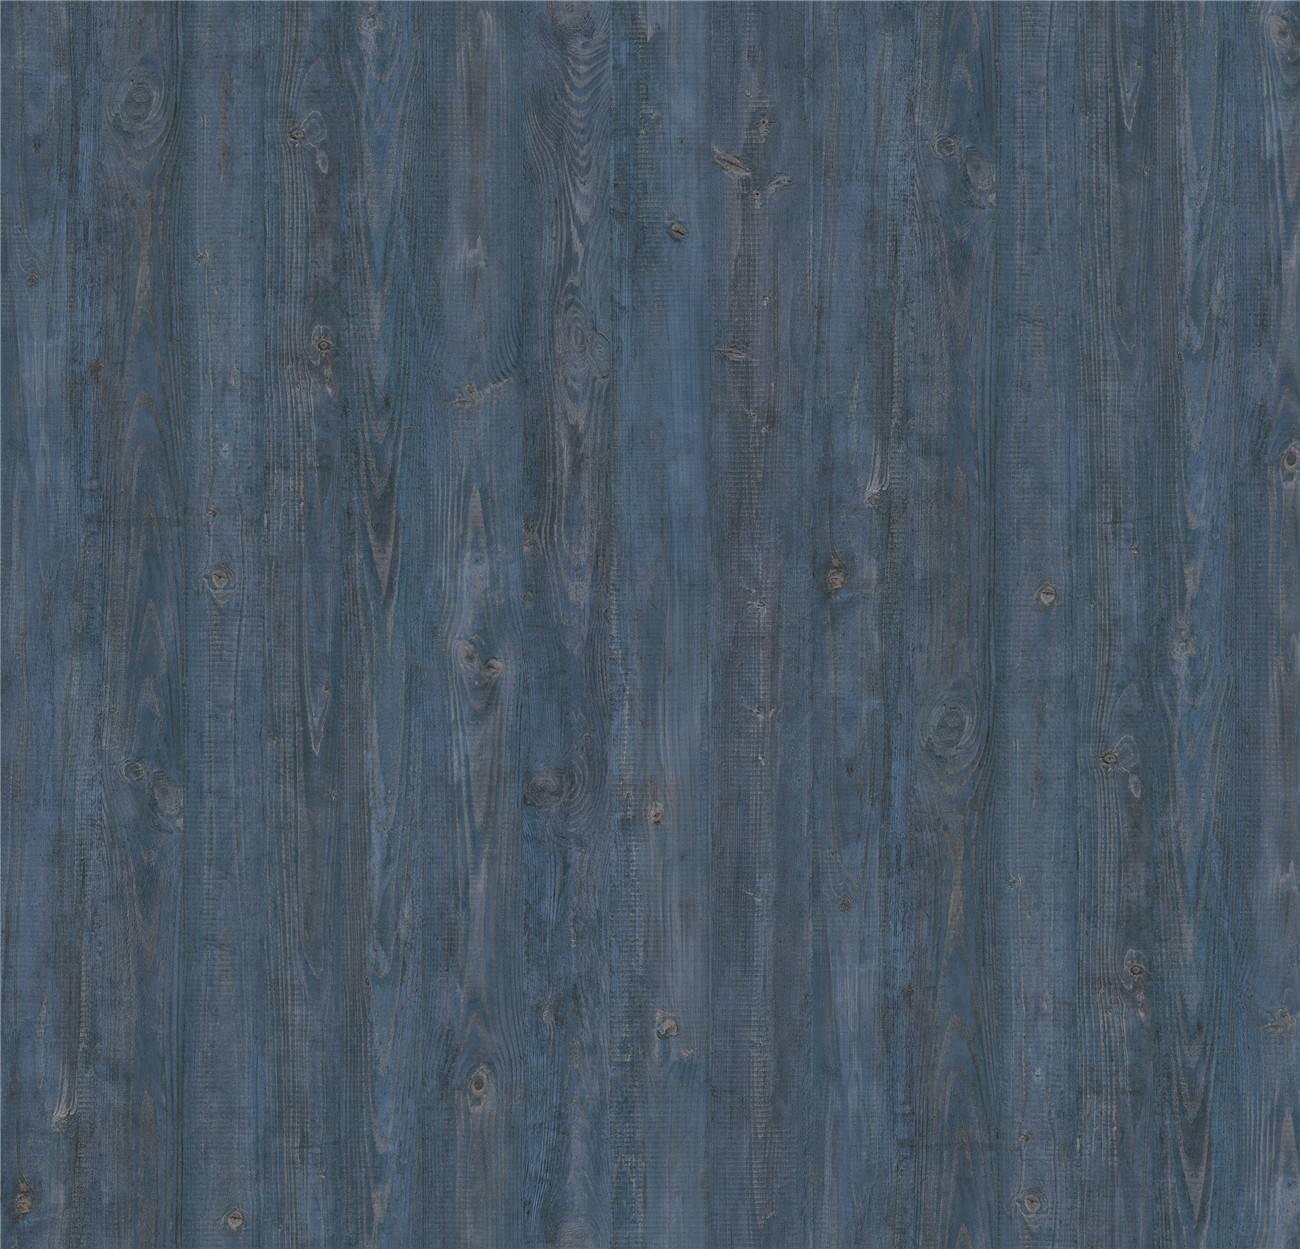 I.DECOR ID7032-03 Hekios Pine ID Series 2017 image44